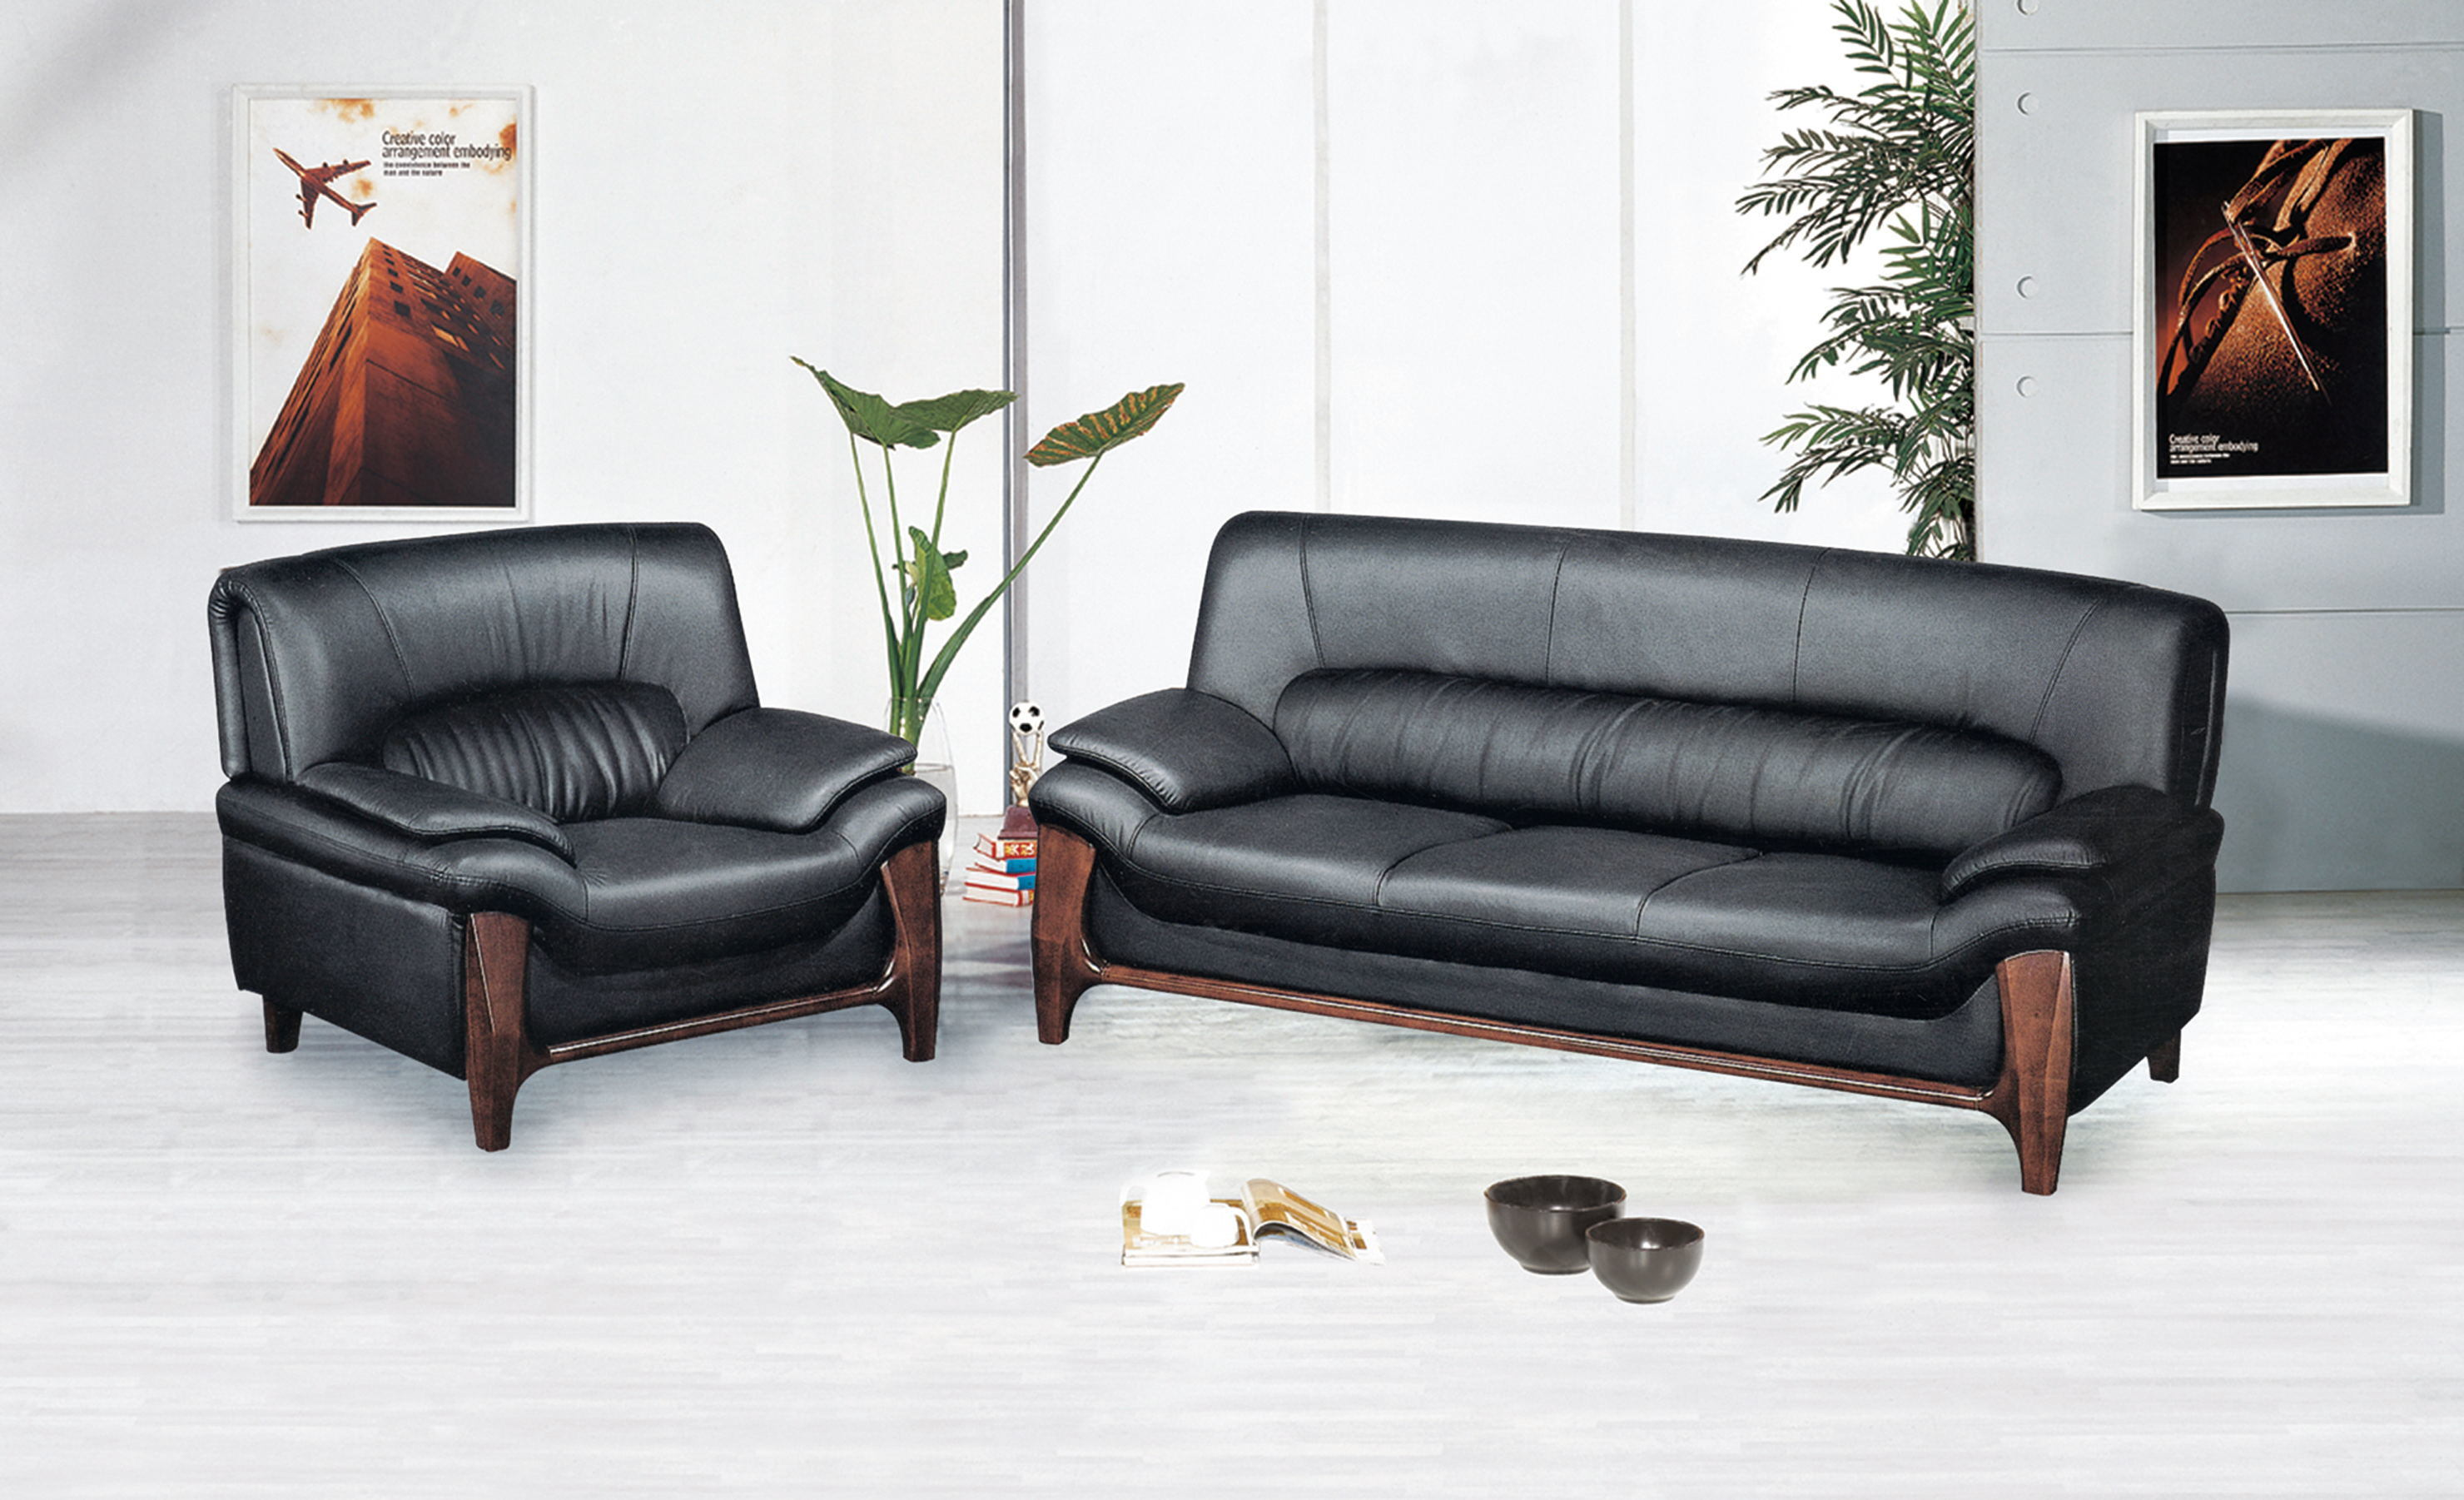 China Best Quality Sofa Office Sofa (FECE378) - China Office Sofa, Sofa